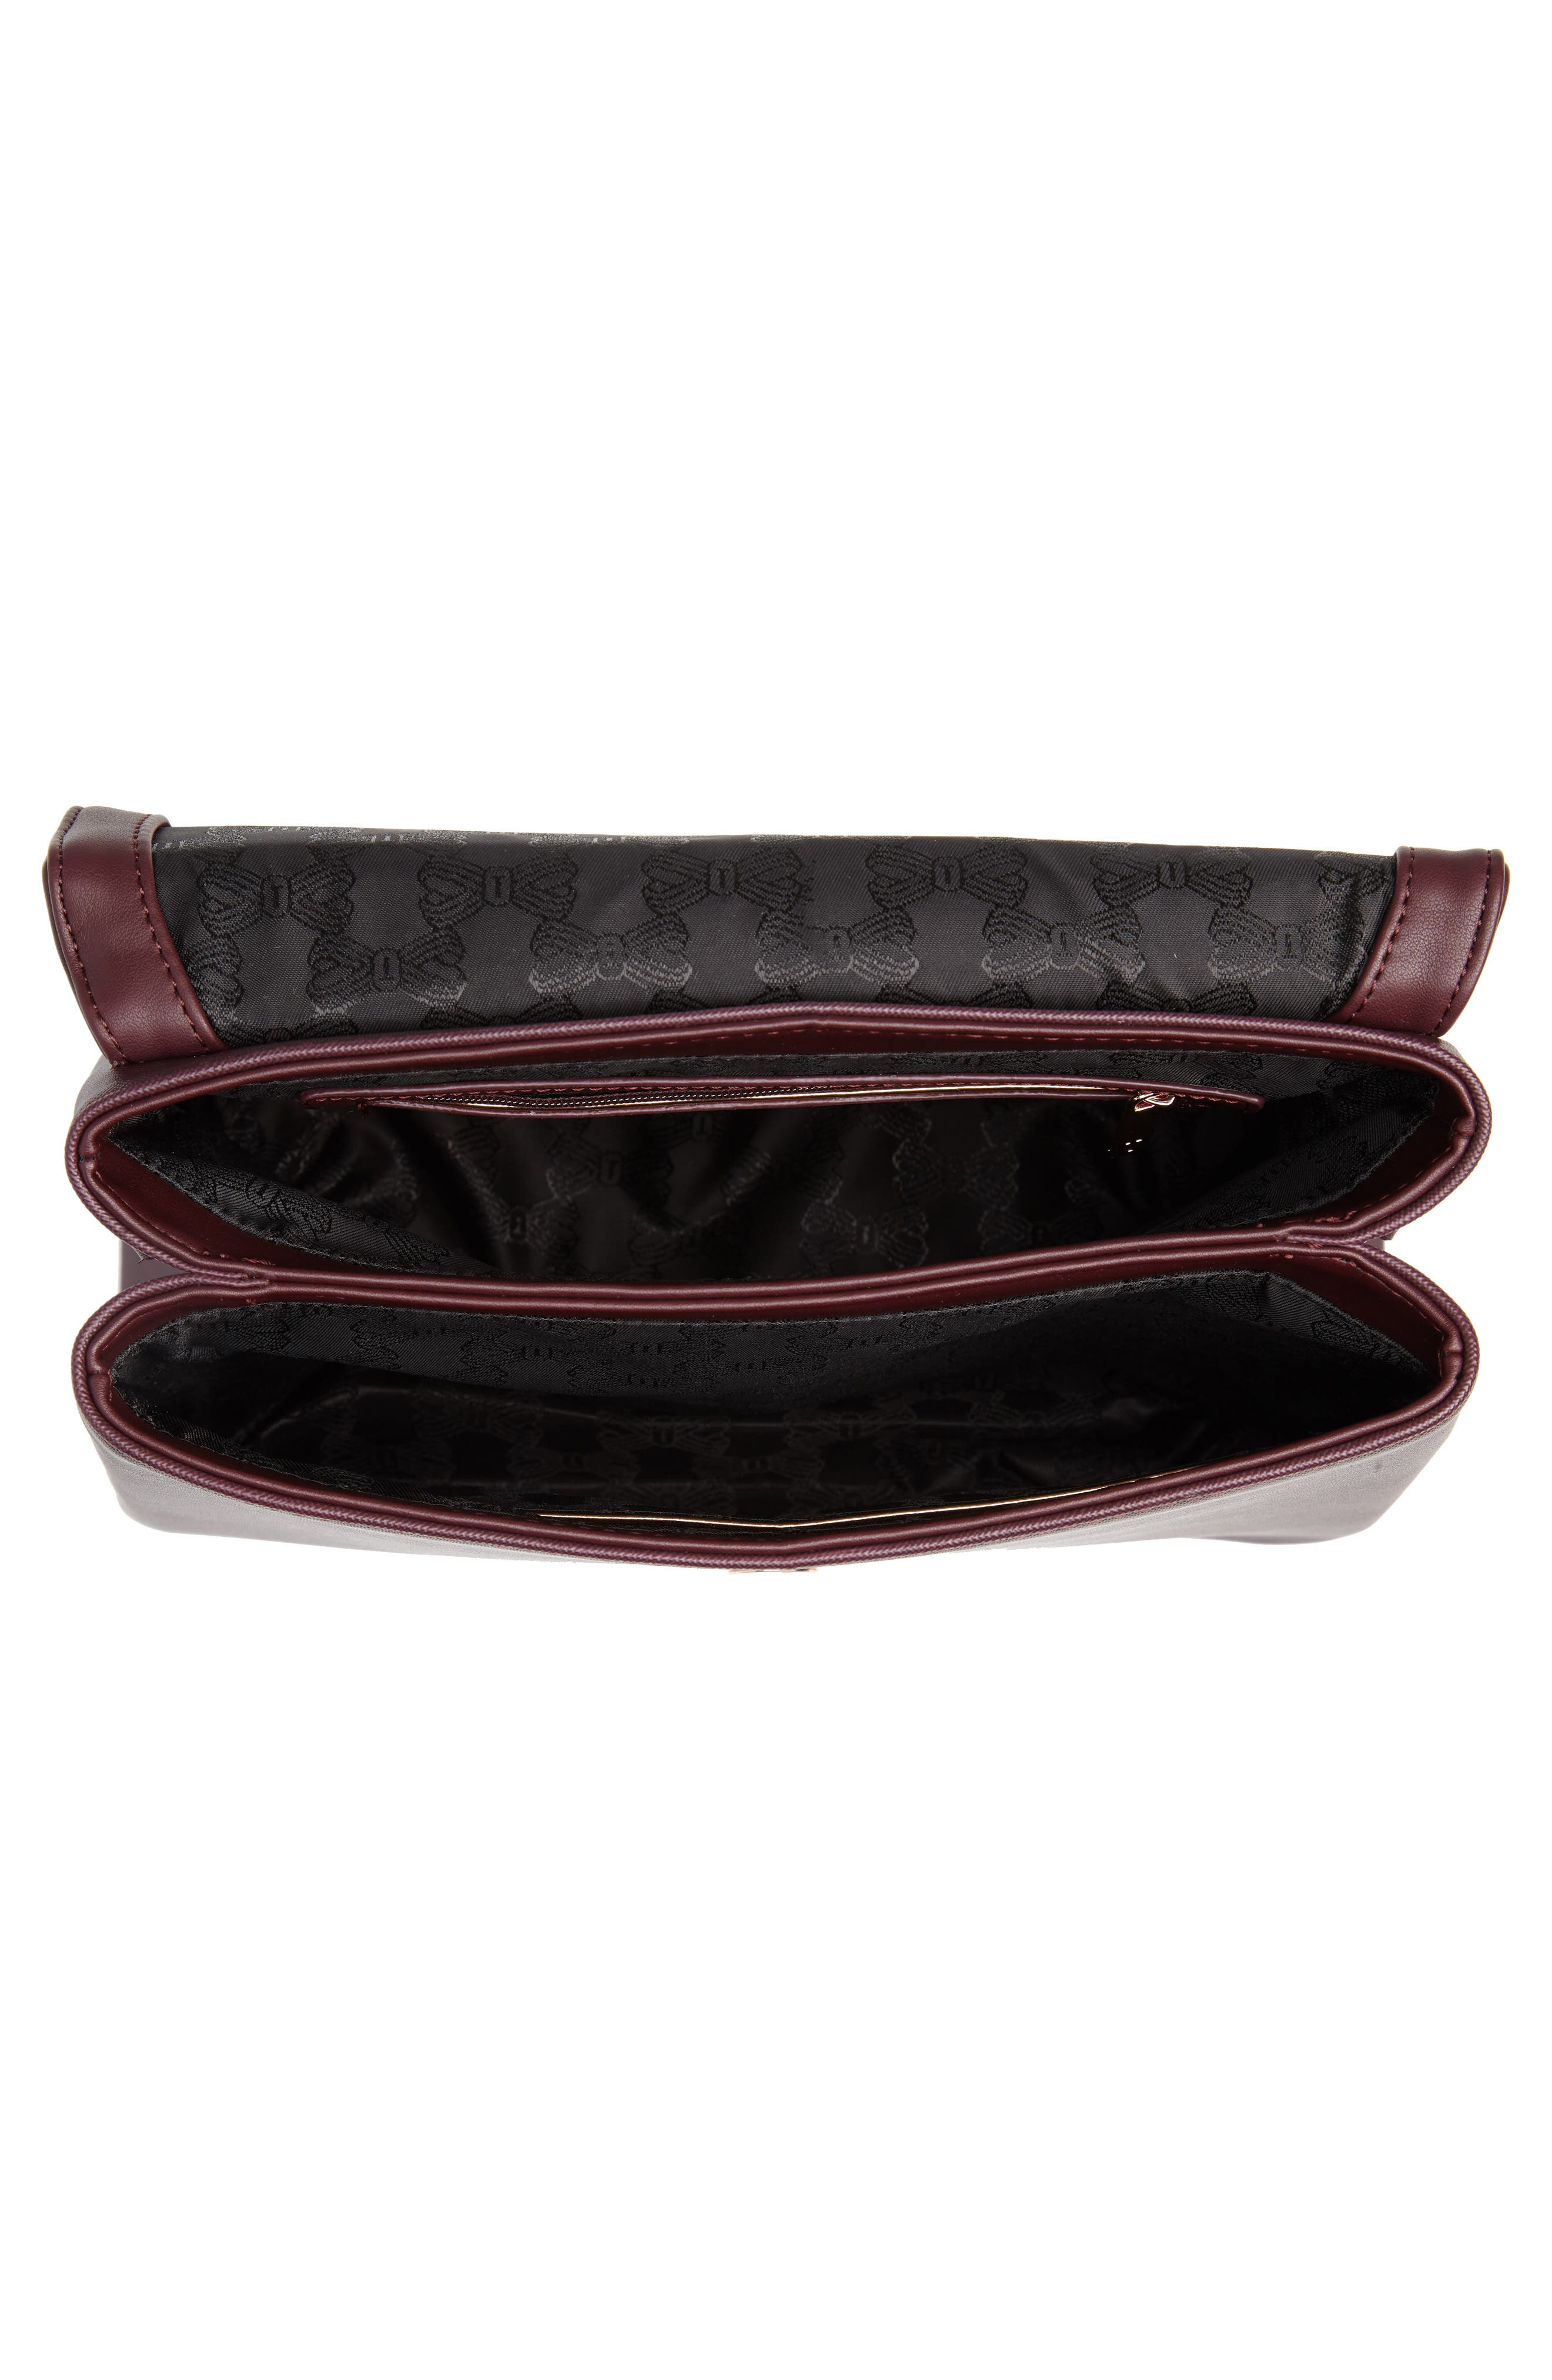 Keiira Lady Bag Faux Leather Top Handle Satchel,                             Alternate thumbnail 4, color,                             DEEP PURPLE